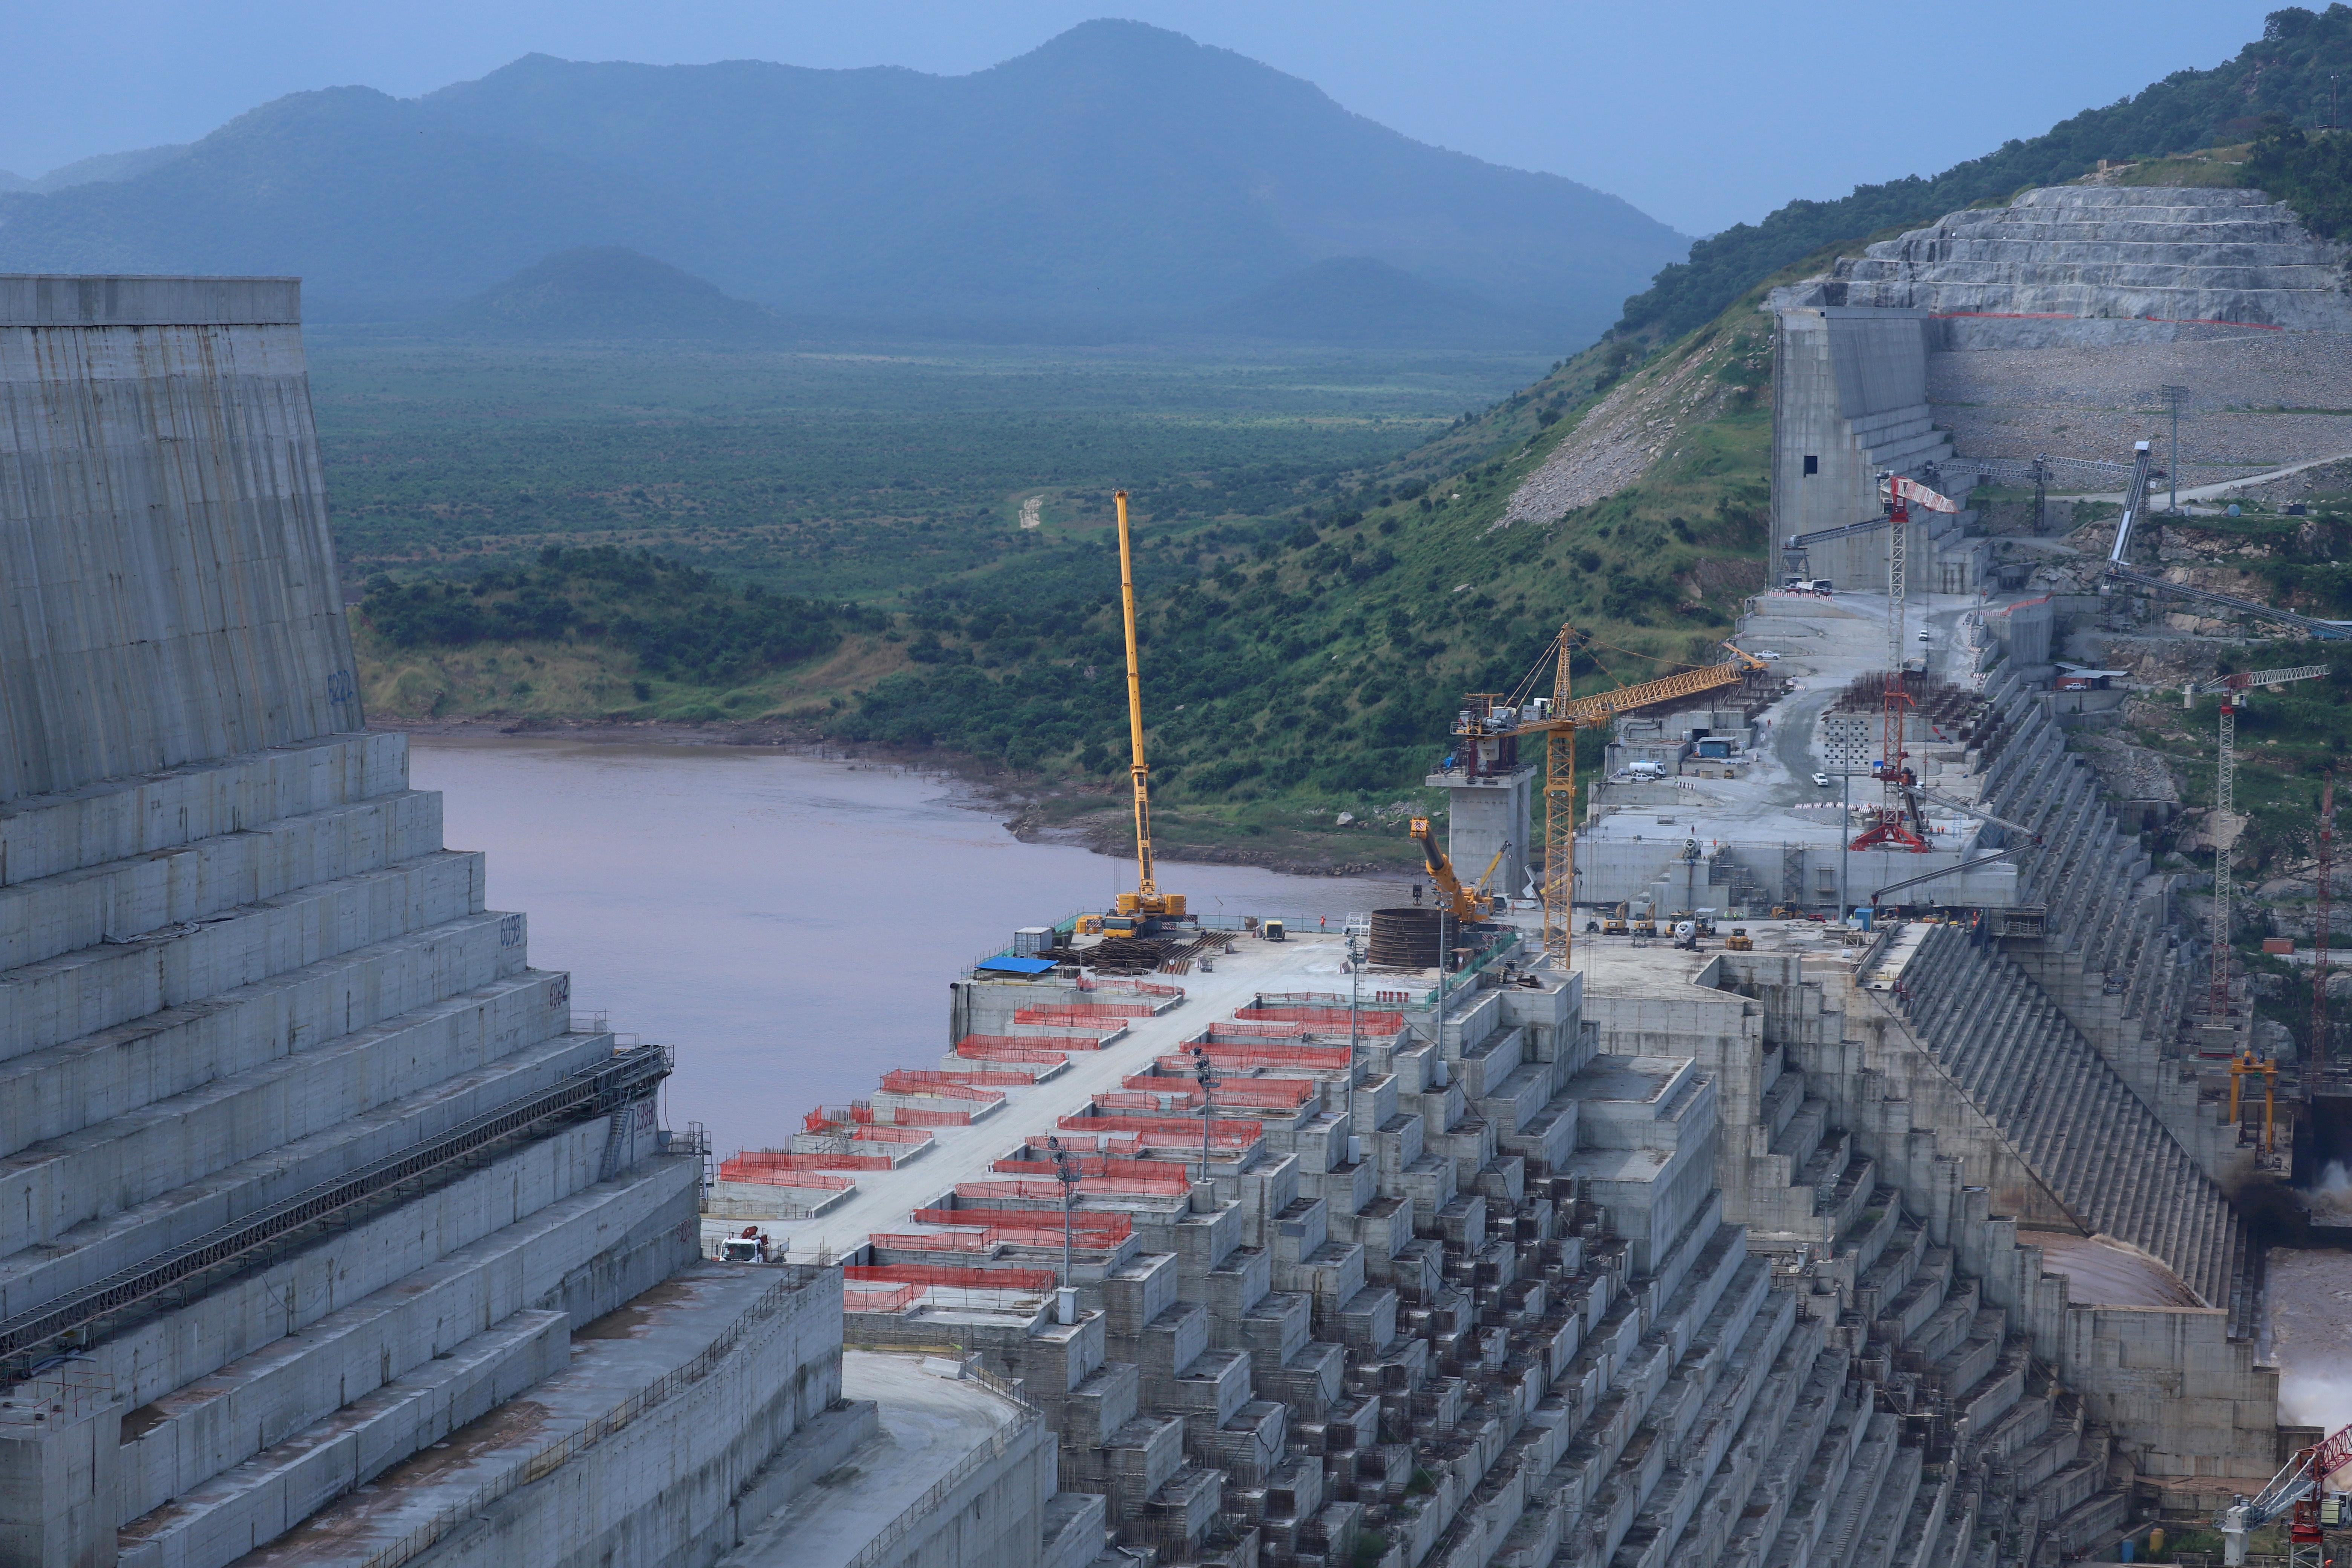 Ethiopia's Grand Renaissance Dam is seen as it undergoes construction work on the river Nile in Guba Woreda, Benishangul Gumuz Region, Ethiopia September 26, 2019. REUTERS/Tiksa Negeri/File Photo/File Photo